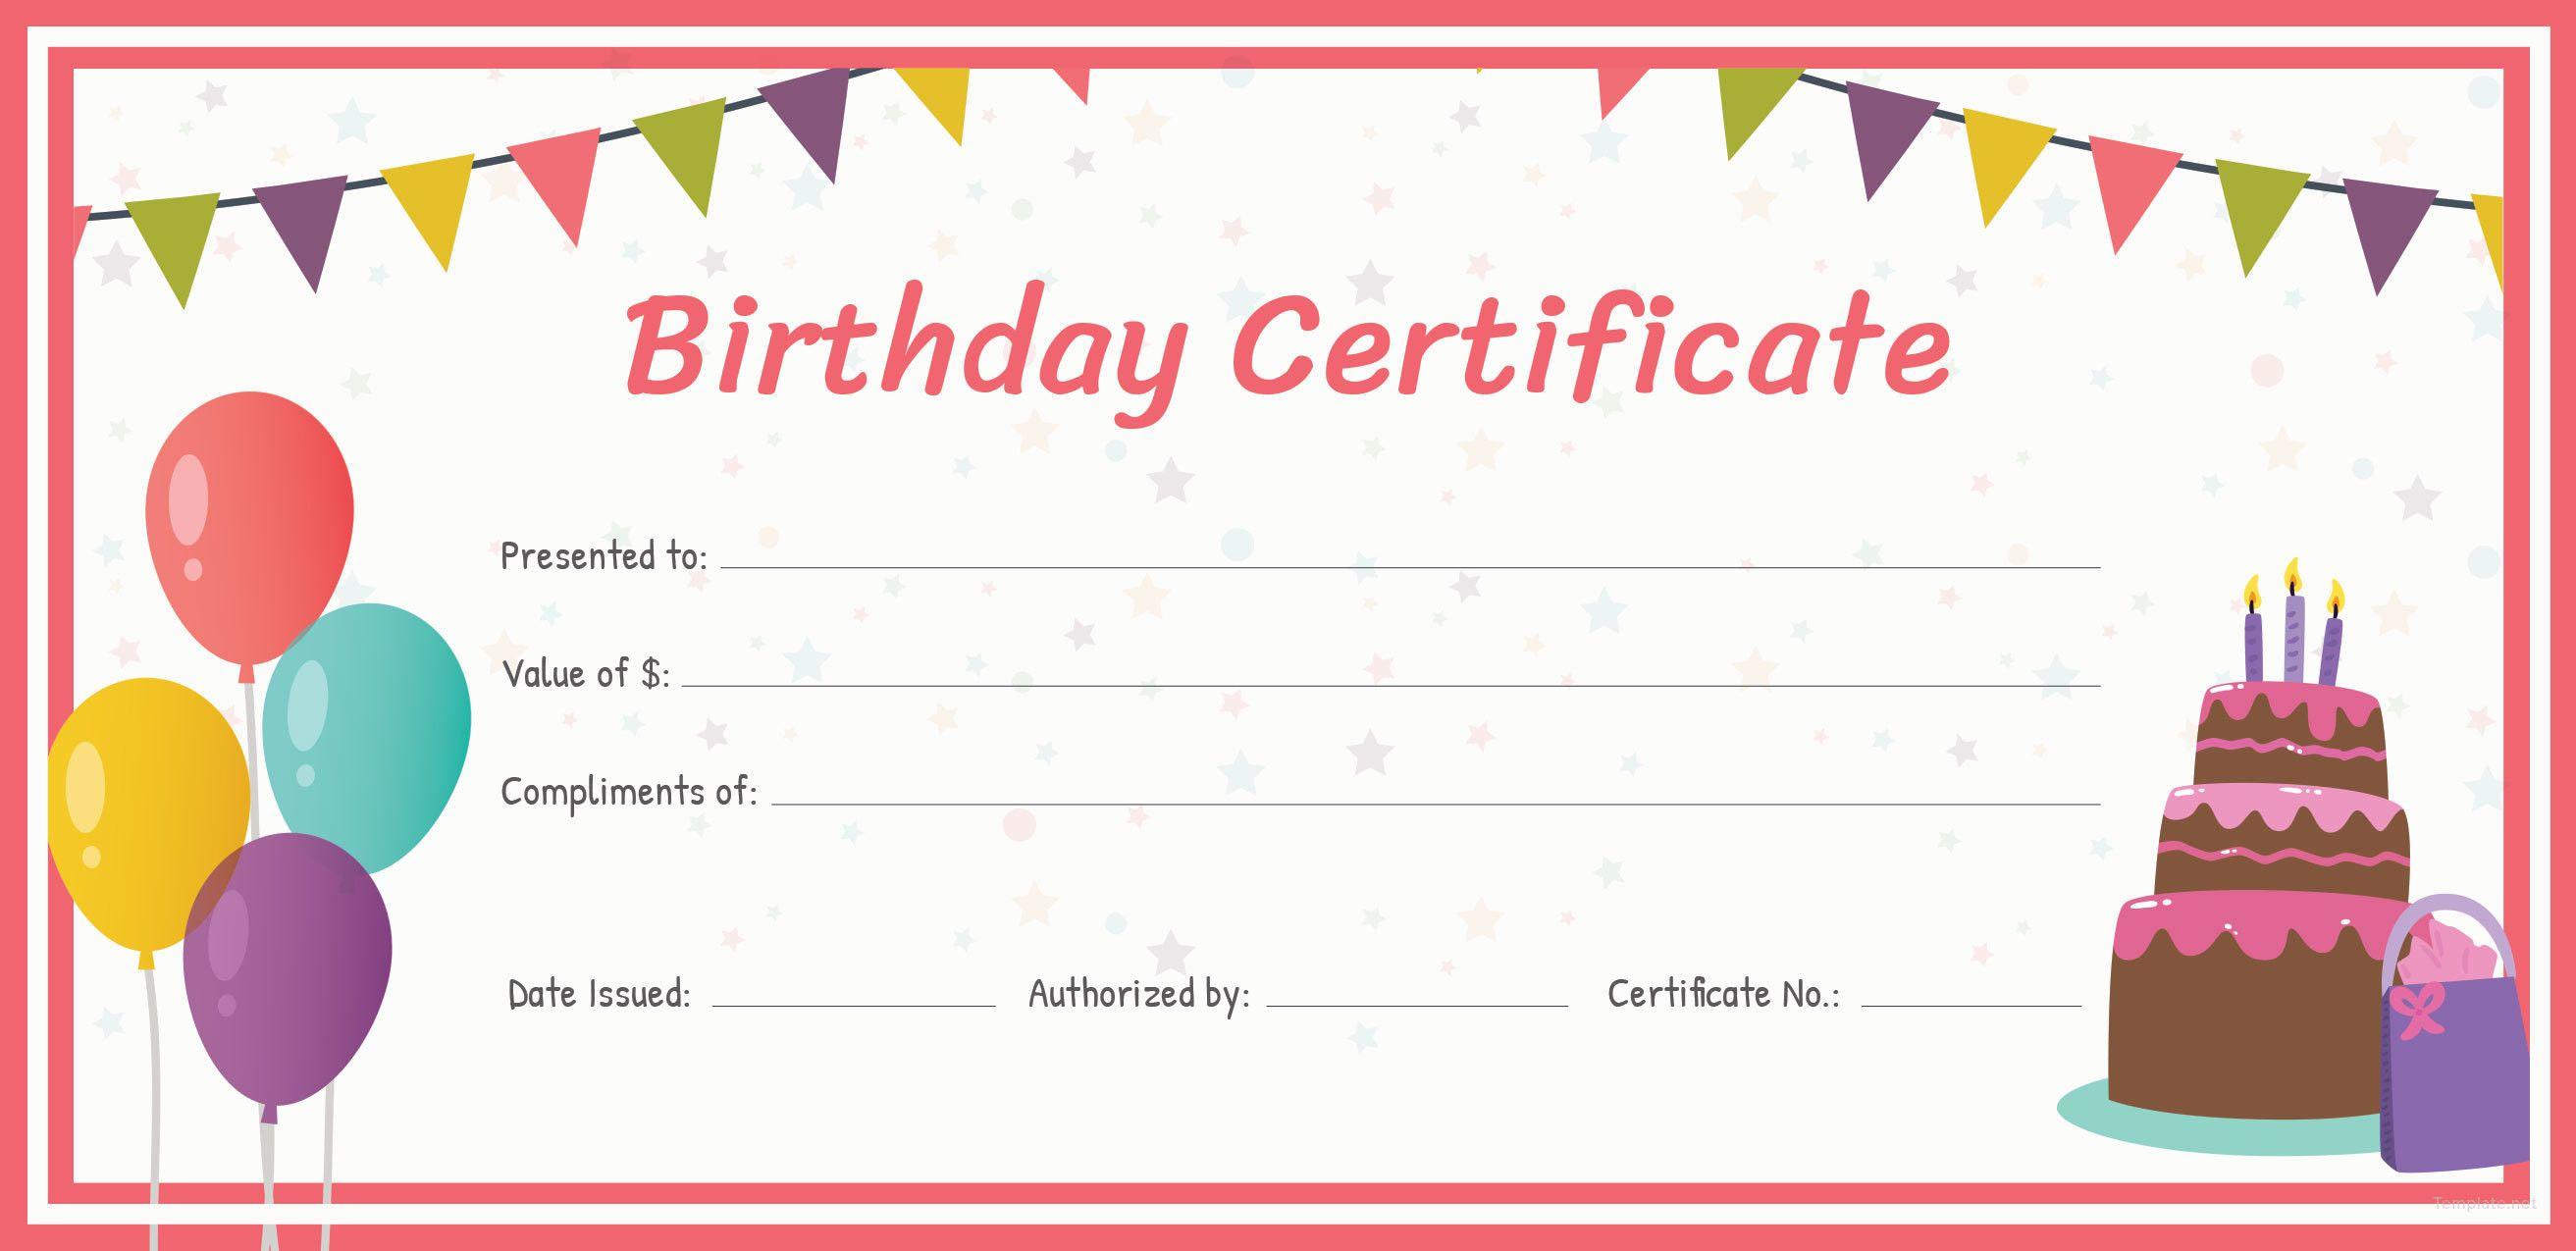 Free Christmas Printable Gift Certificates The Diary Of A Christmas Gift Certificate Template Holiday Gift Certificates Free Printable Gift Certificates